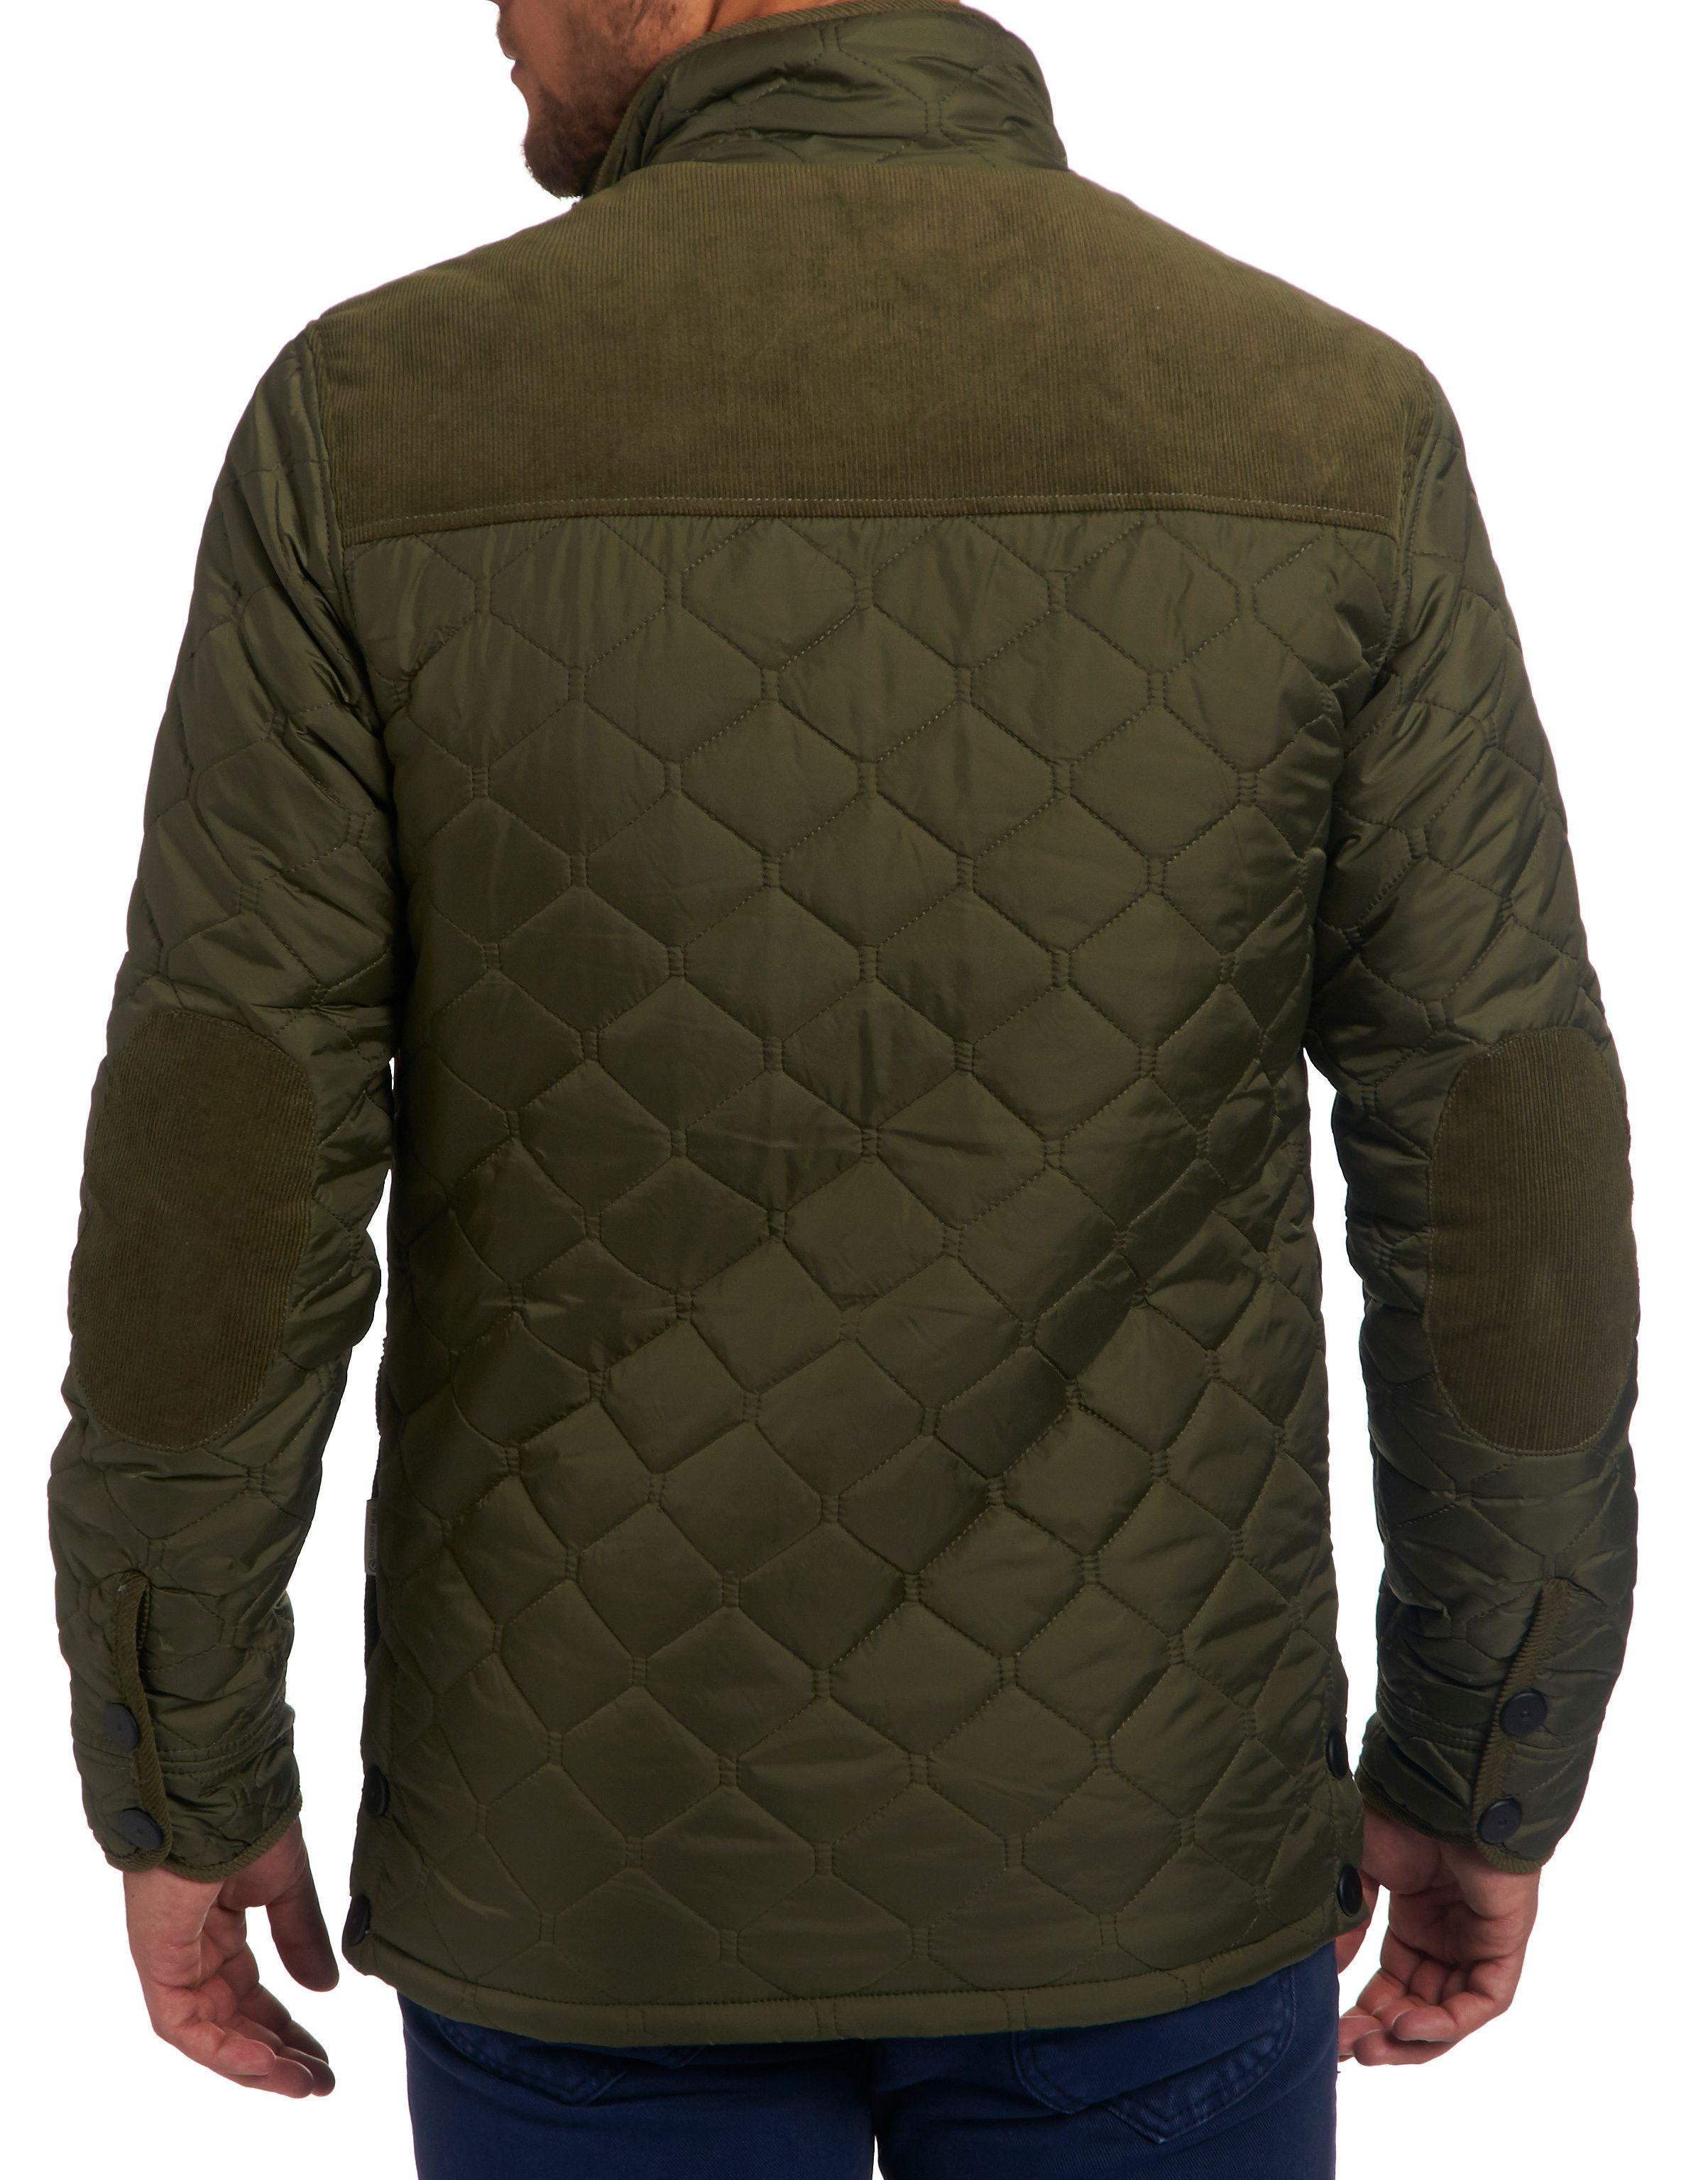 Sonneti Batallion Quilted Jacket